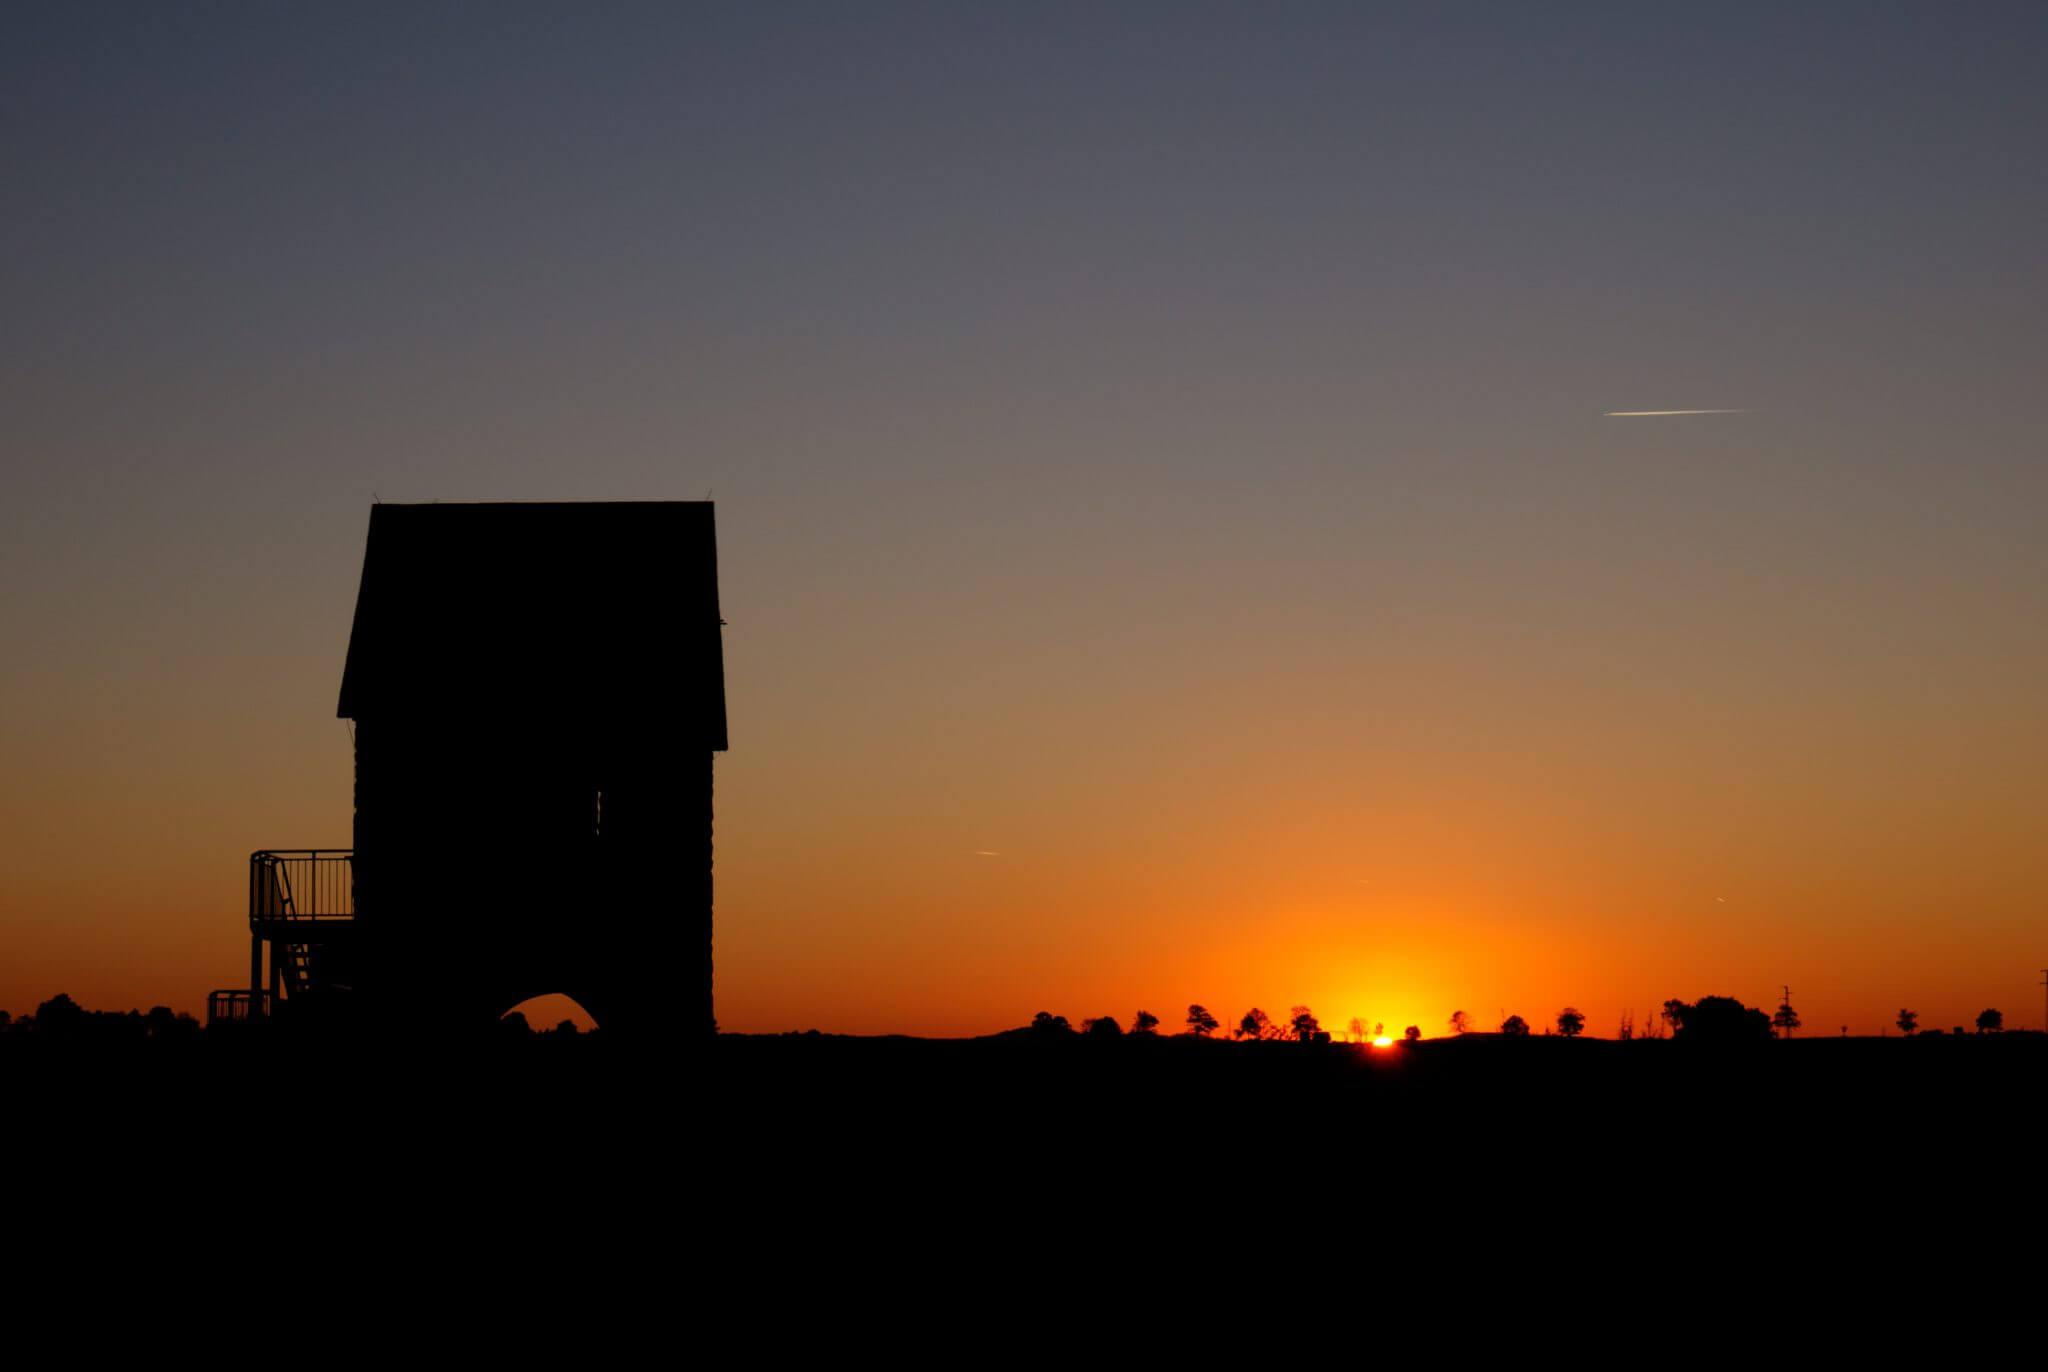 Königspfalz Werla im Sonnenuntergang